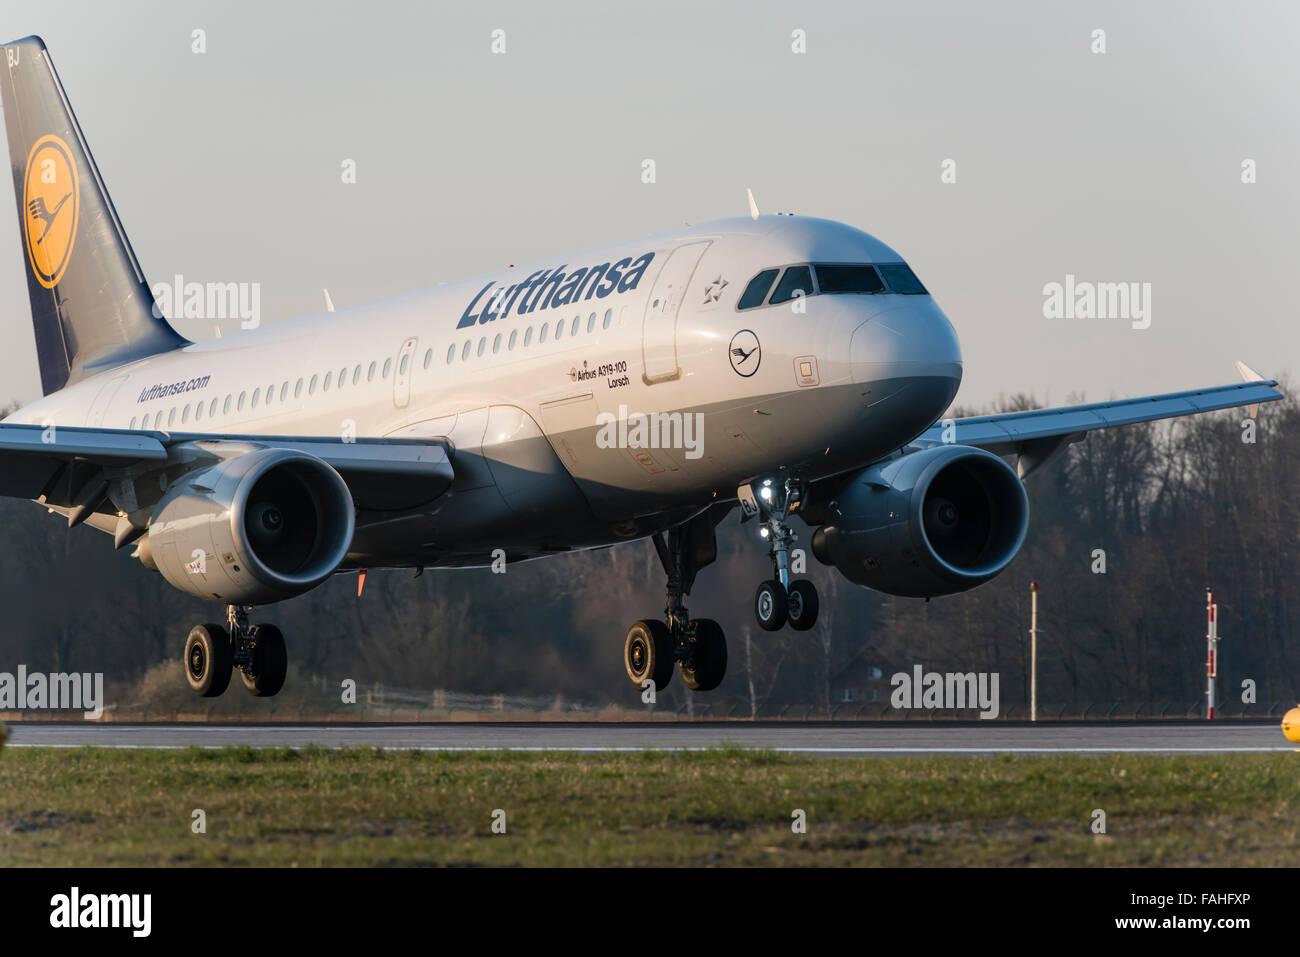 Airbus A319-100 passenger aircraft of German Lufthansa before touchdown on Zurich International airport. - Stock Image